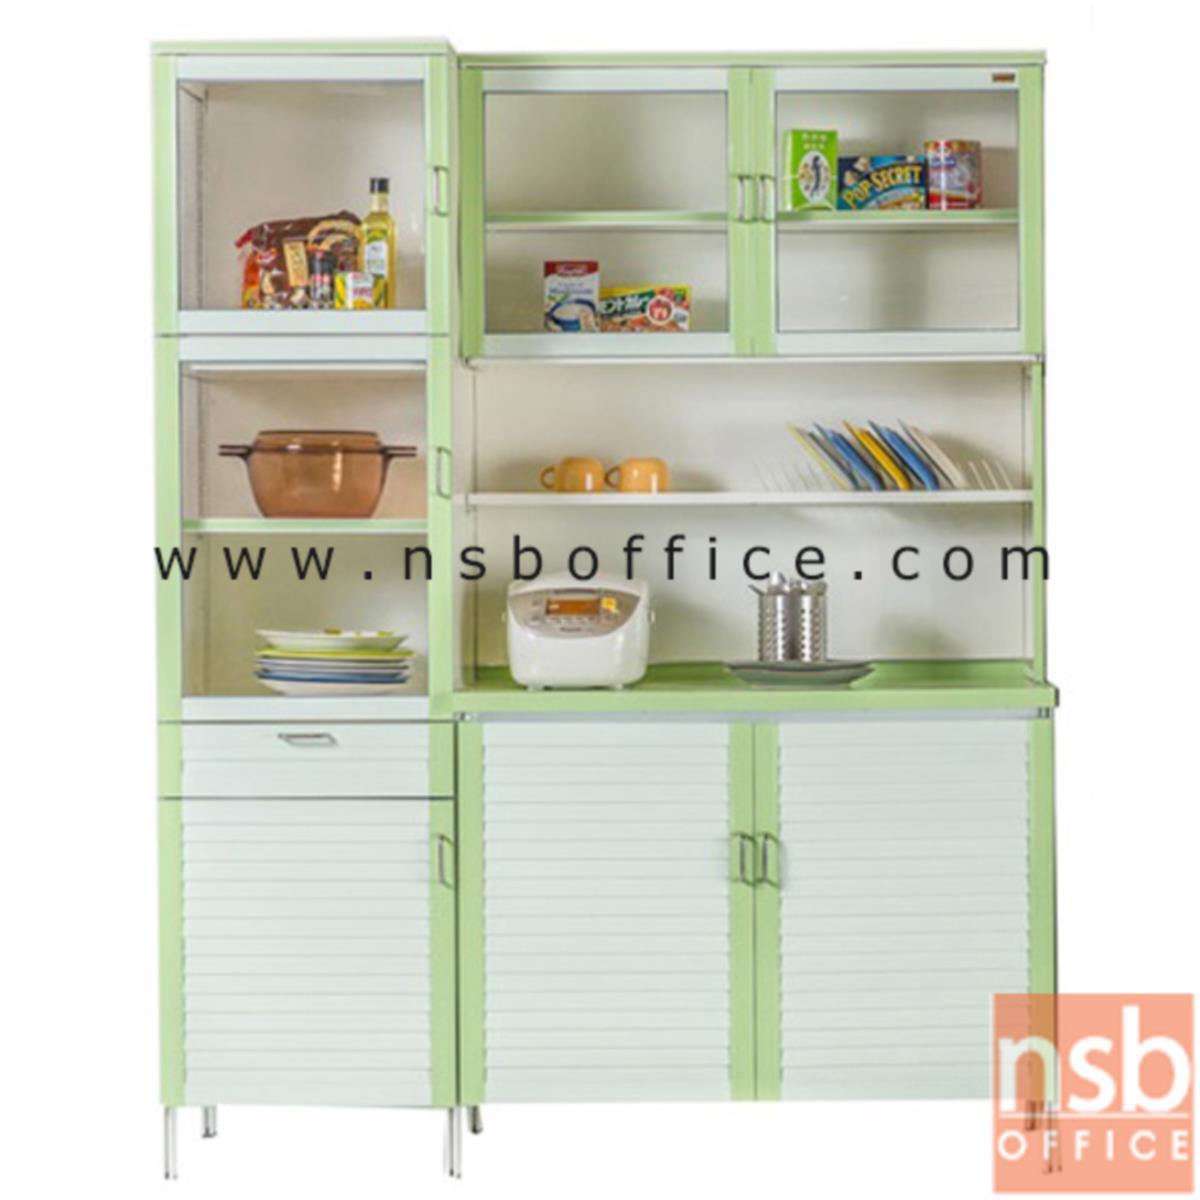 G07A083:ตู้ครัวสำหรับเก็บของใช้และอาหาร  ขนาด 148W*54D*190H cm.